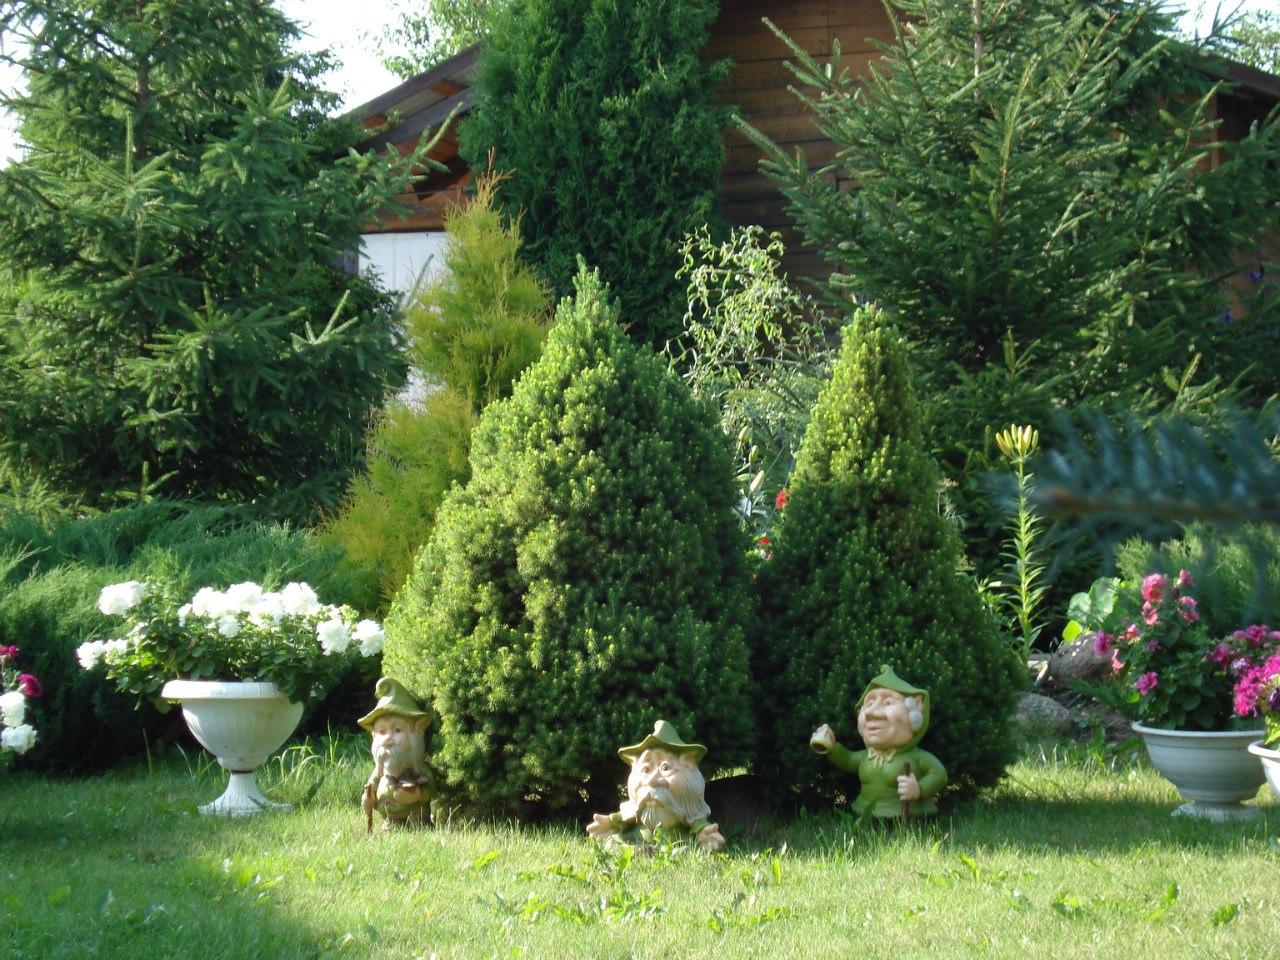 Ели в саду